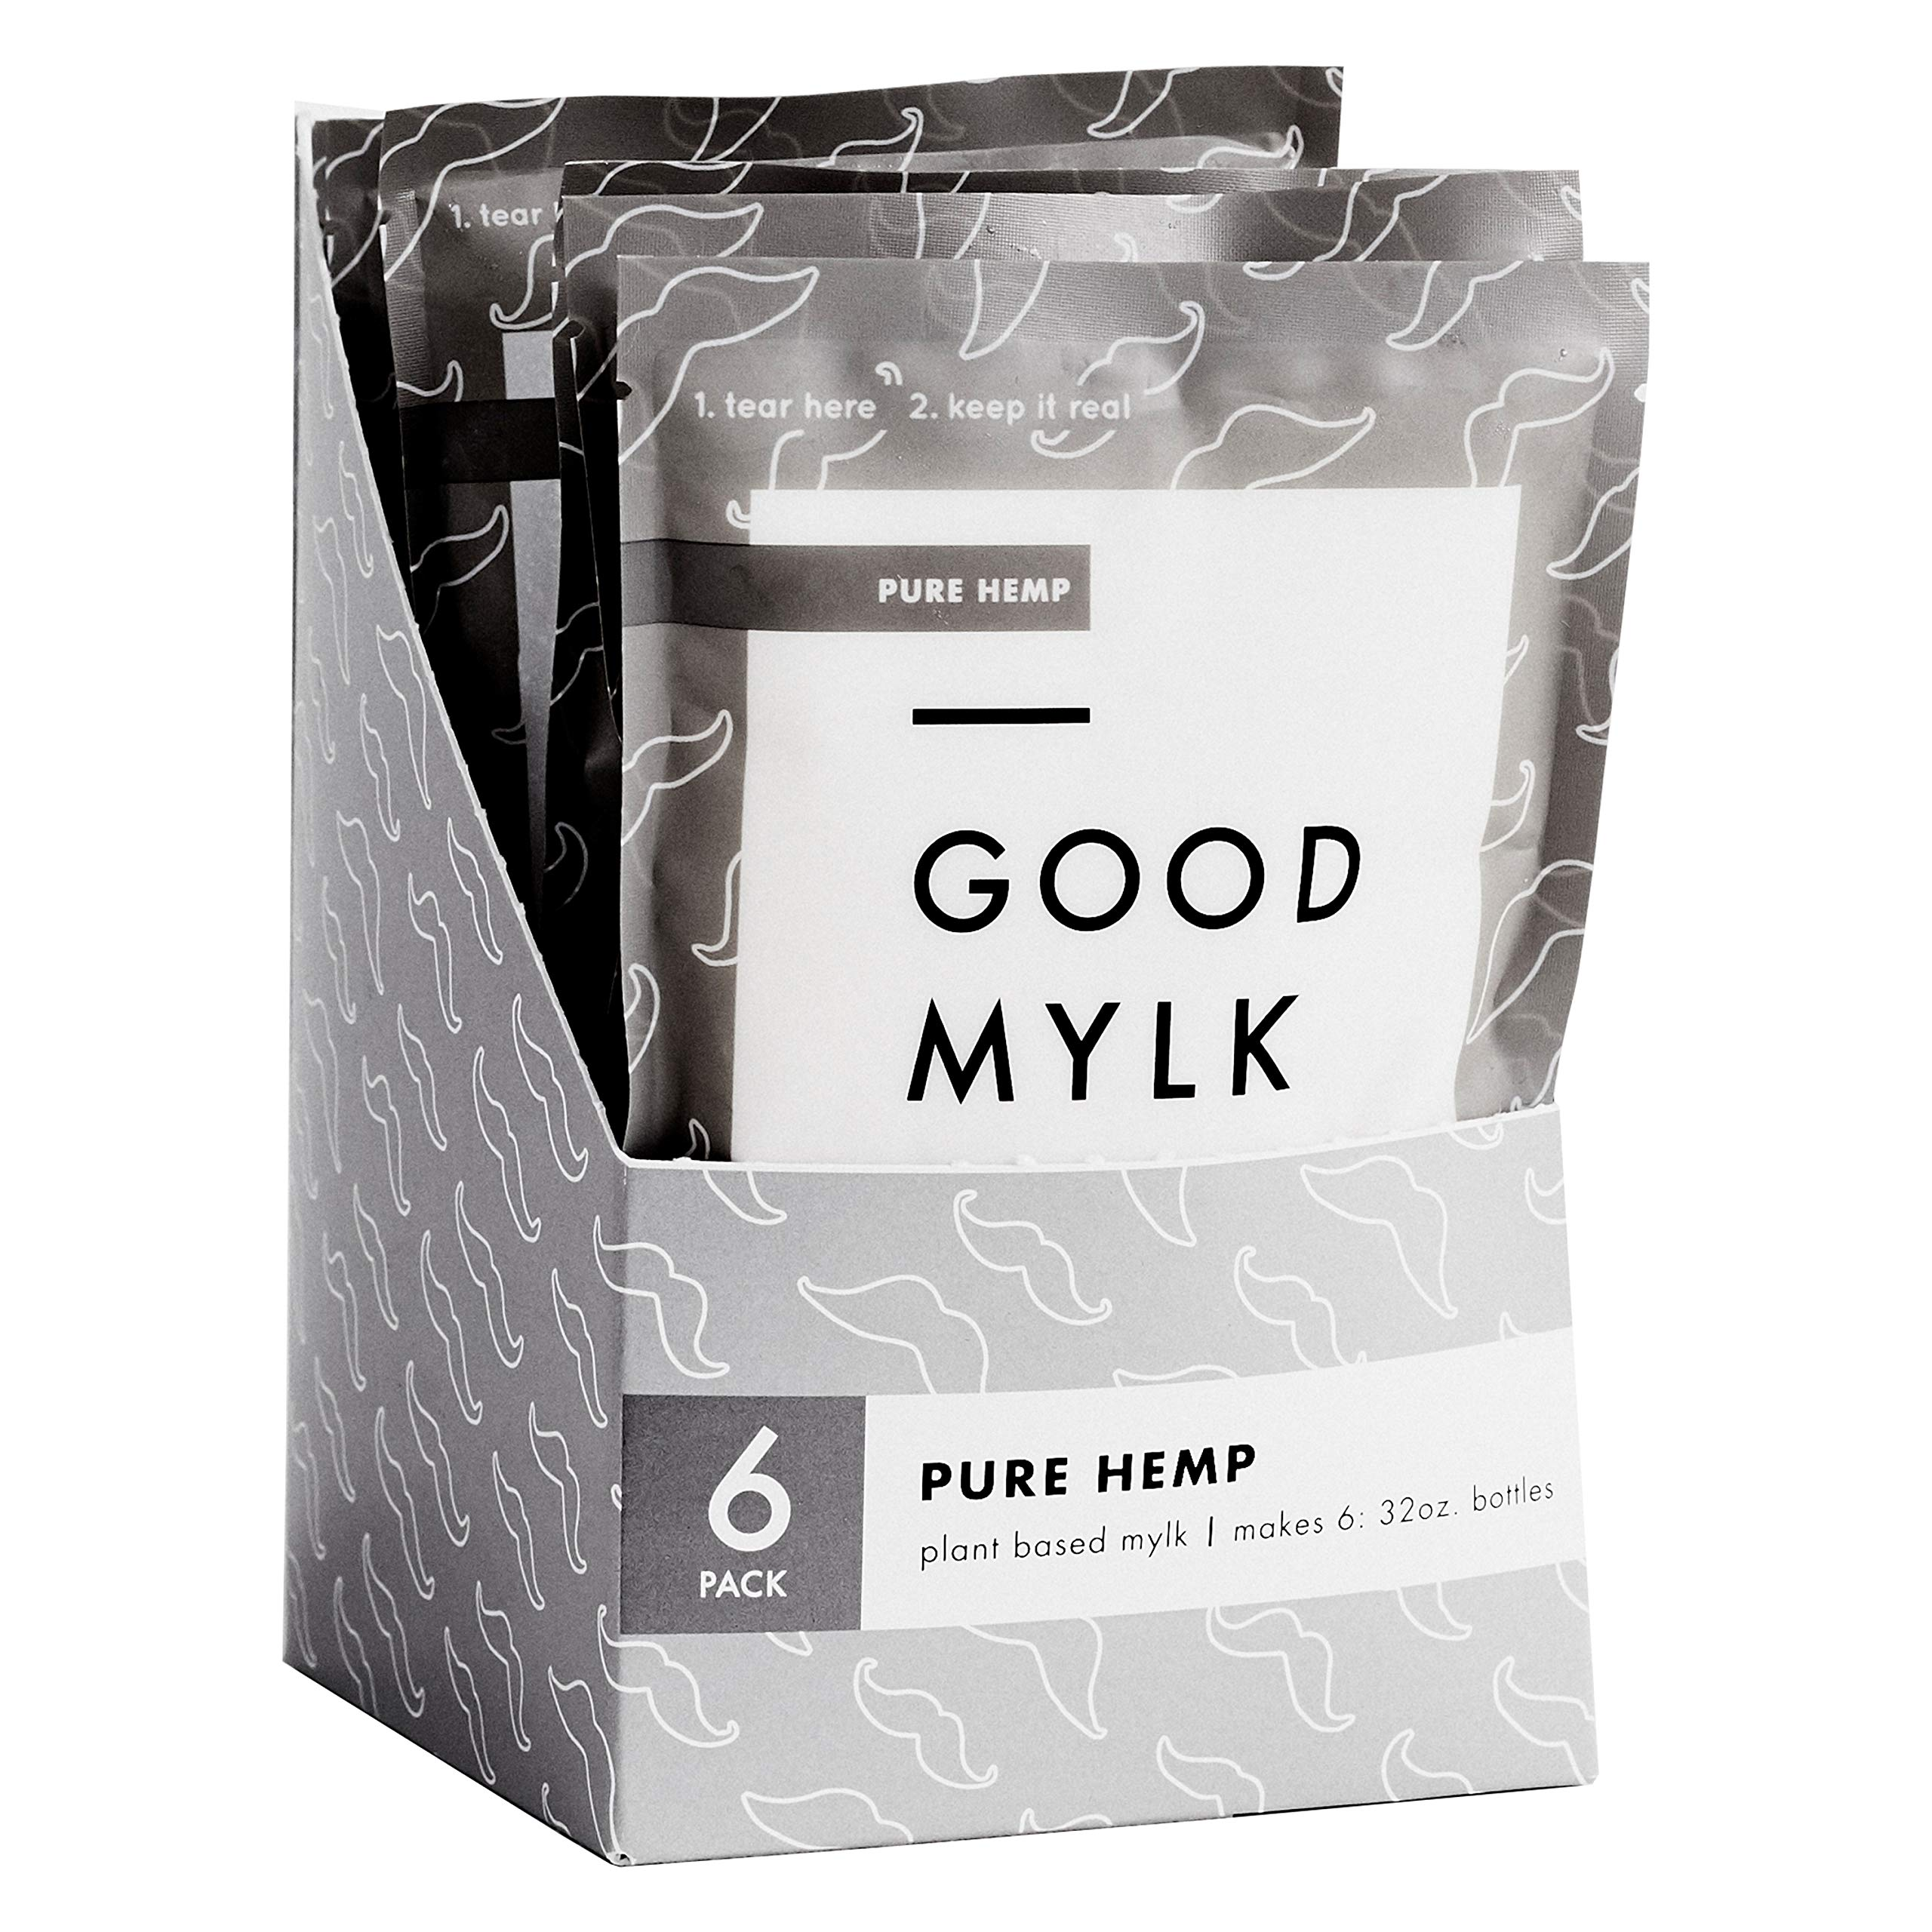 Goodmylk Co. - Organic Hemp Milk Concentrate (6 Pack) - Make Fresh Hemp Milk At Home - Makes 6: 32oz Bottles - Organic, Non-GMO, Vegan, Ships Frozen, Long Shelf Life, Sustainable, Keto, Dairy Free, Store for 10+ months (Unsweetened)